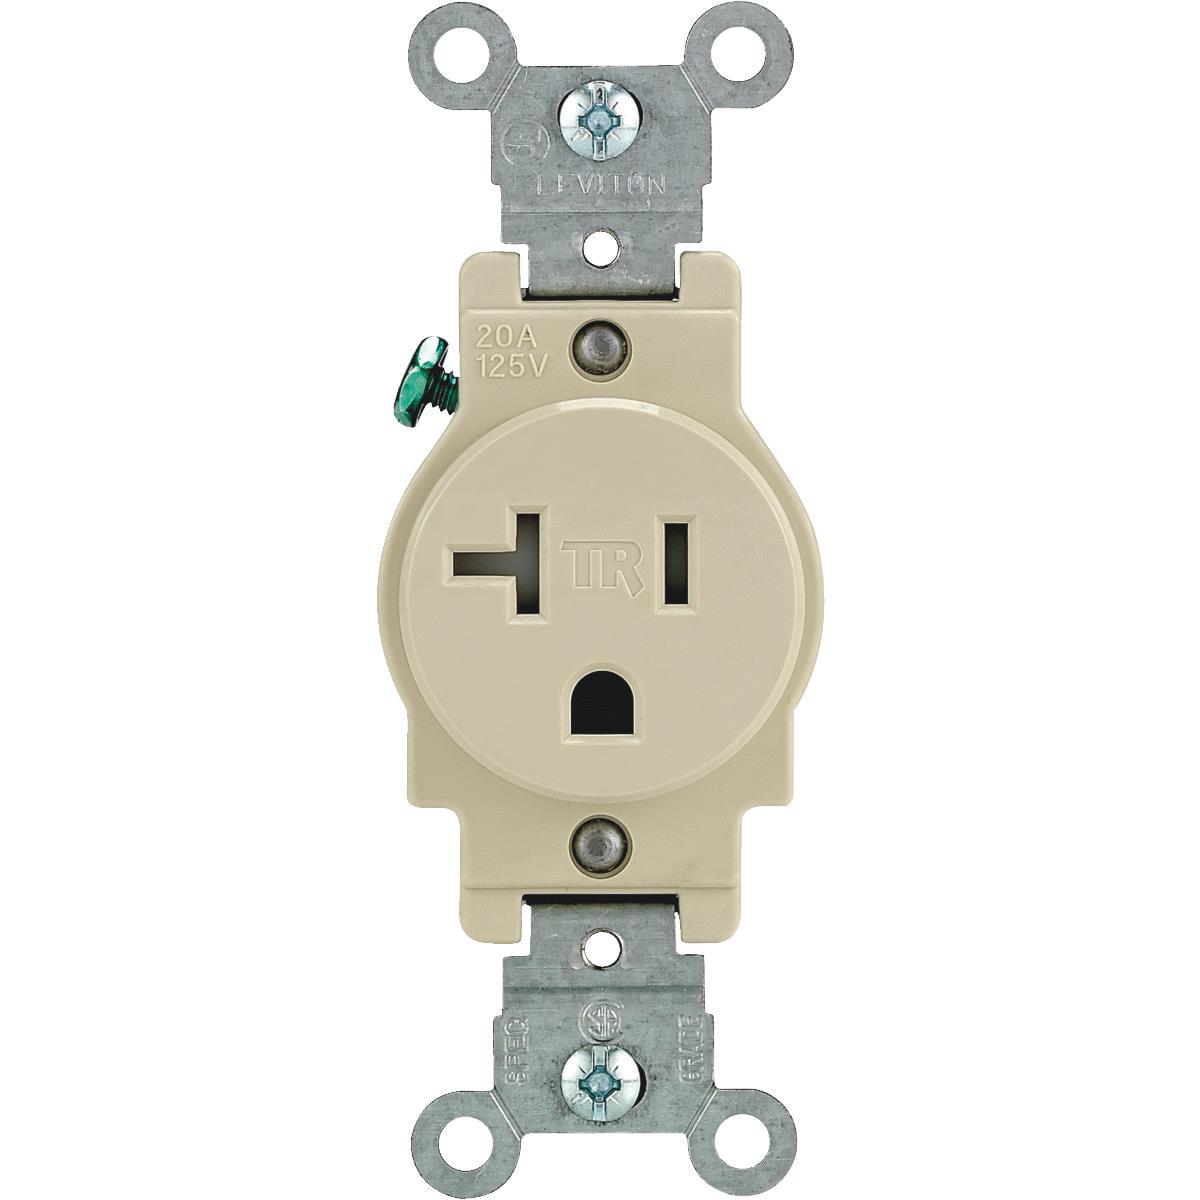 Leviton Commercial Grade Tamper Resistant Single Outlet